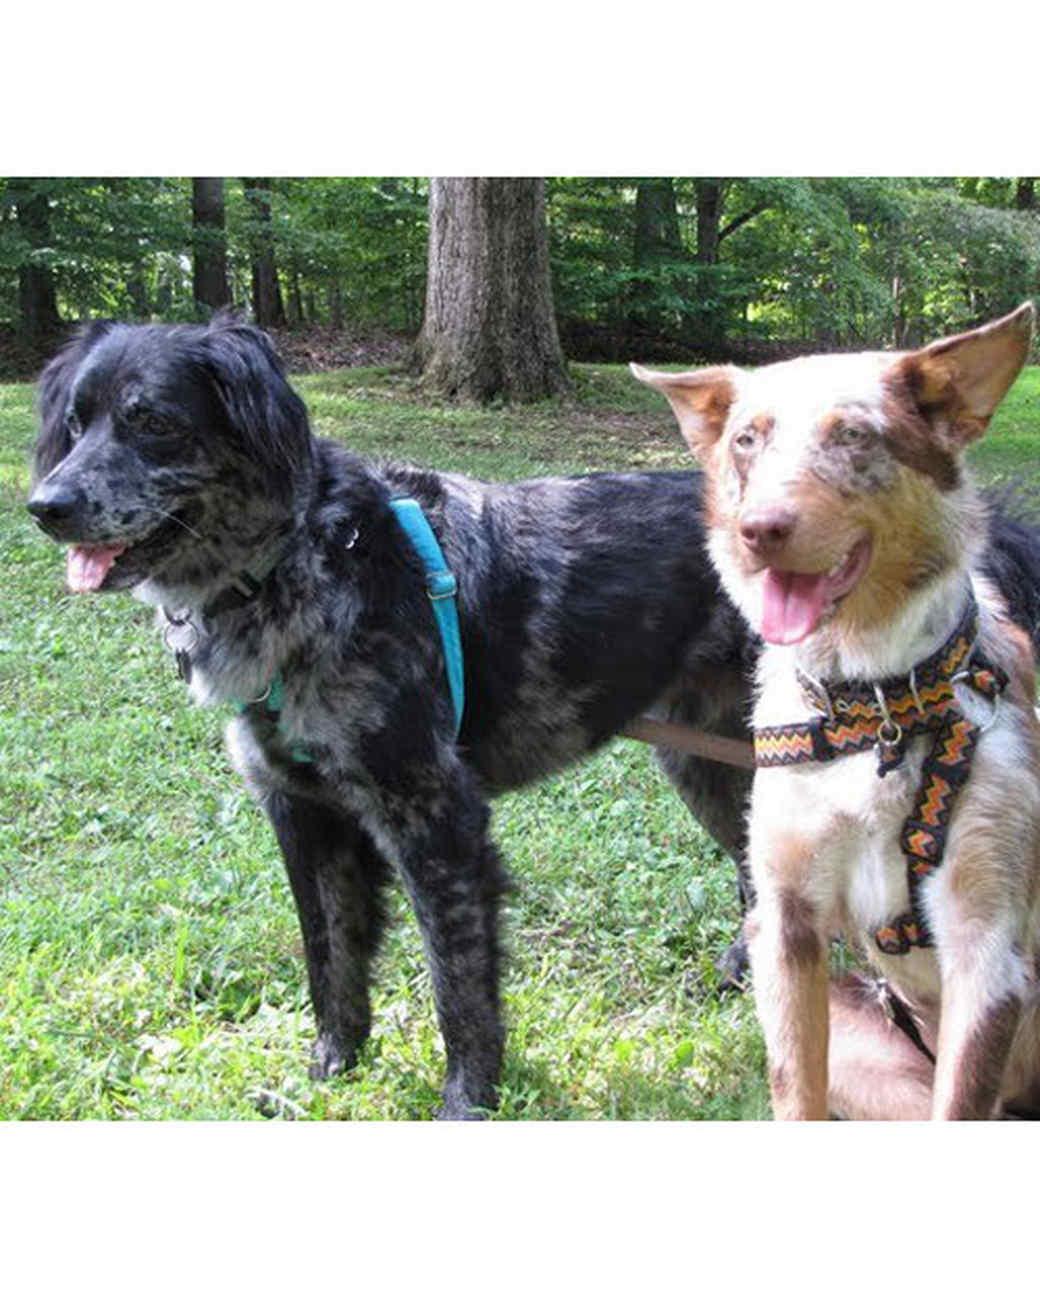 pets_adoption_6718620_18304484.jpg